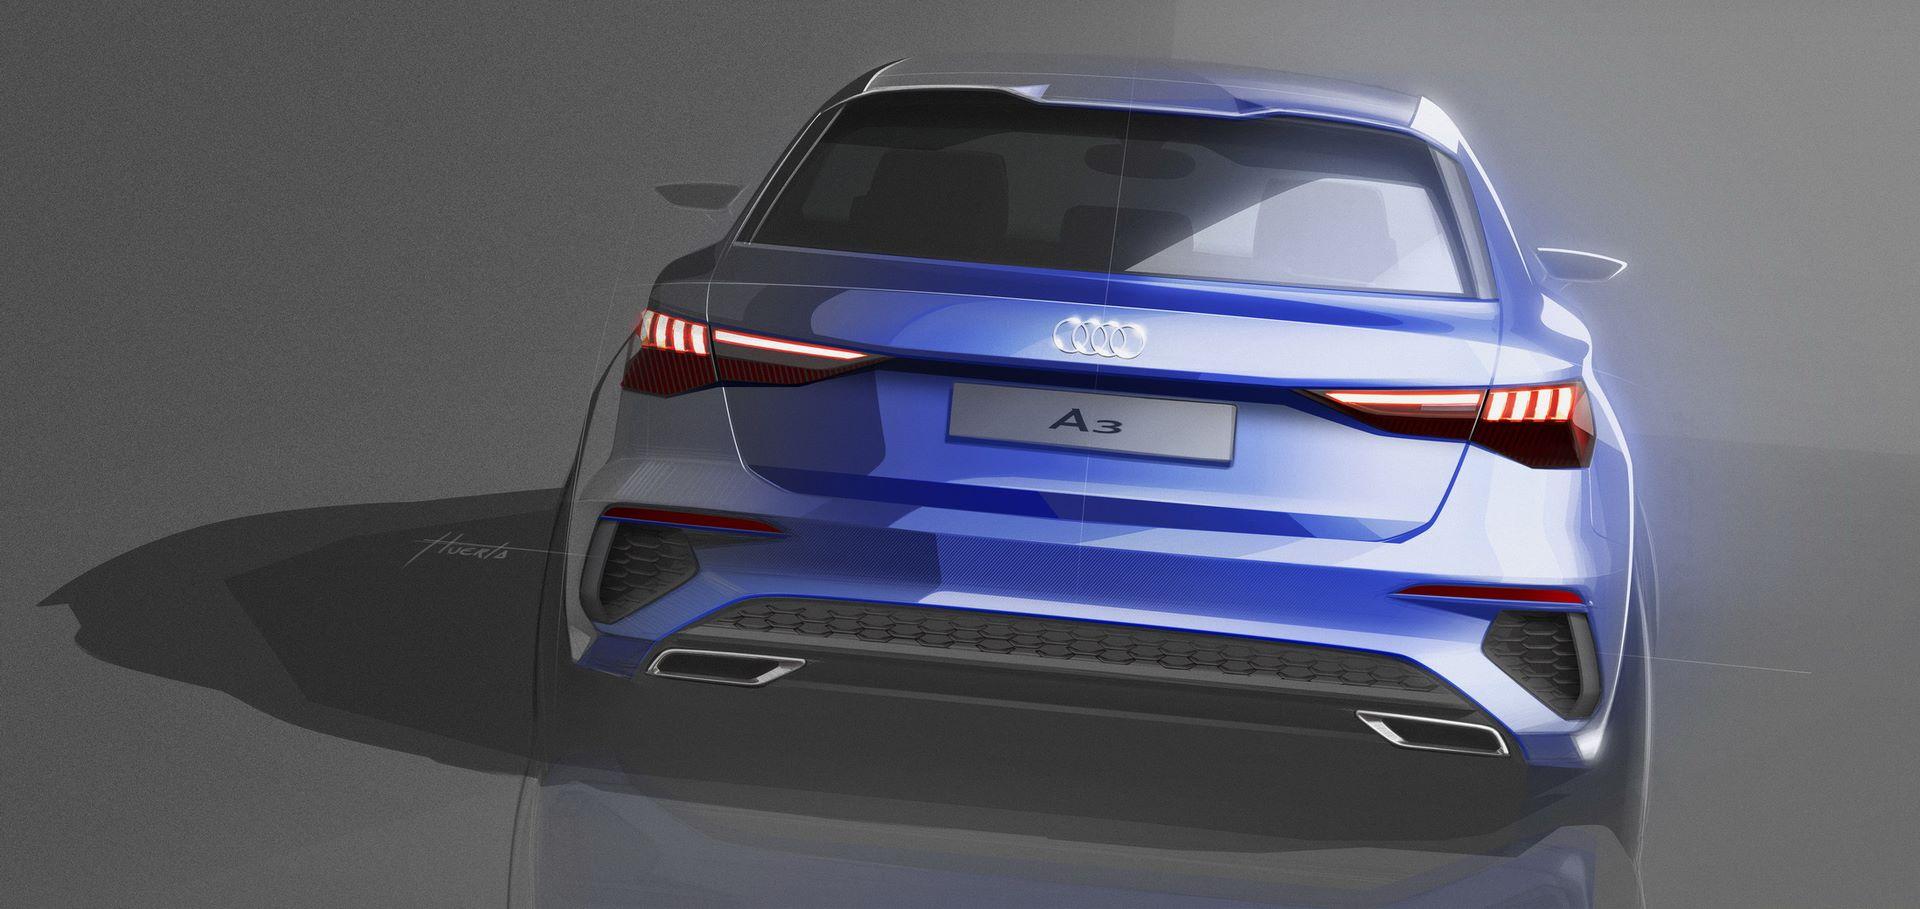 Audi-A3-Sportback-2020-31